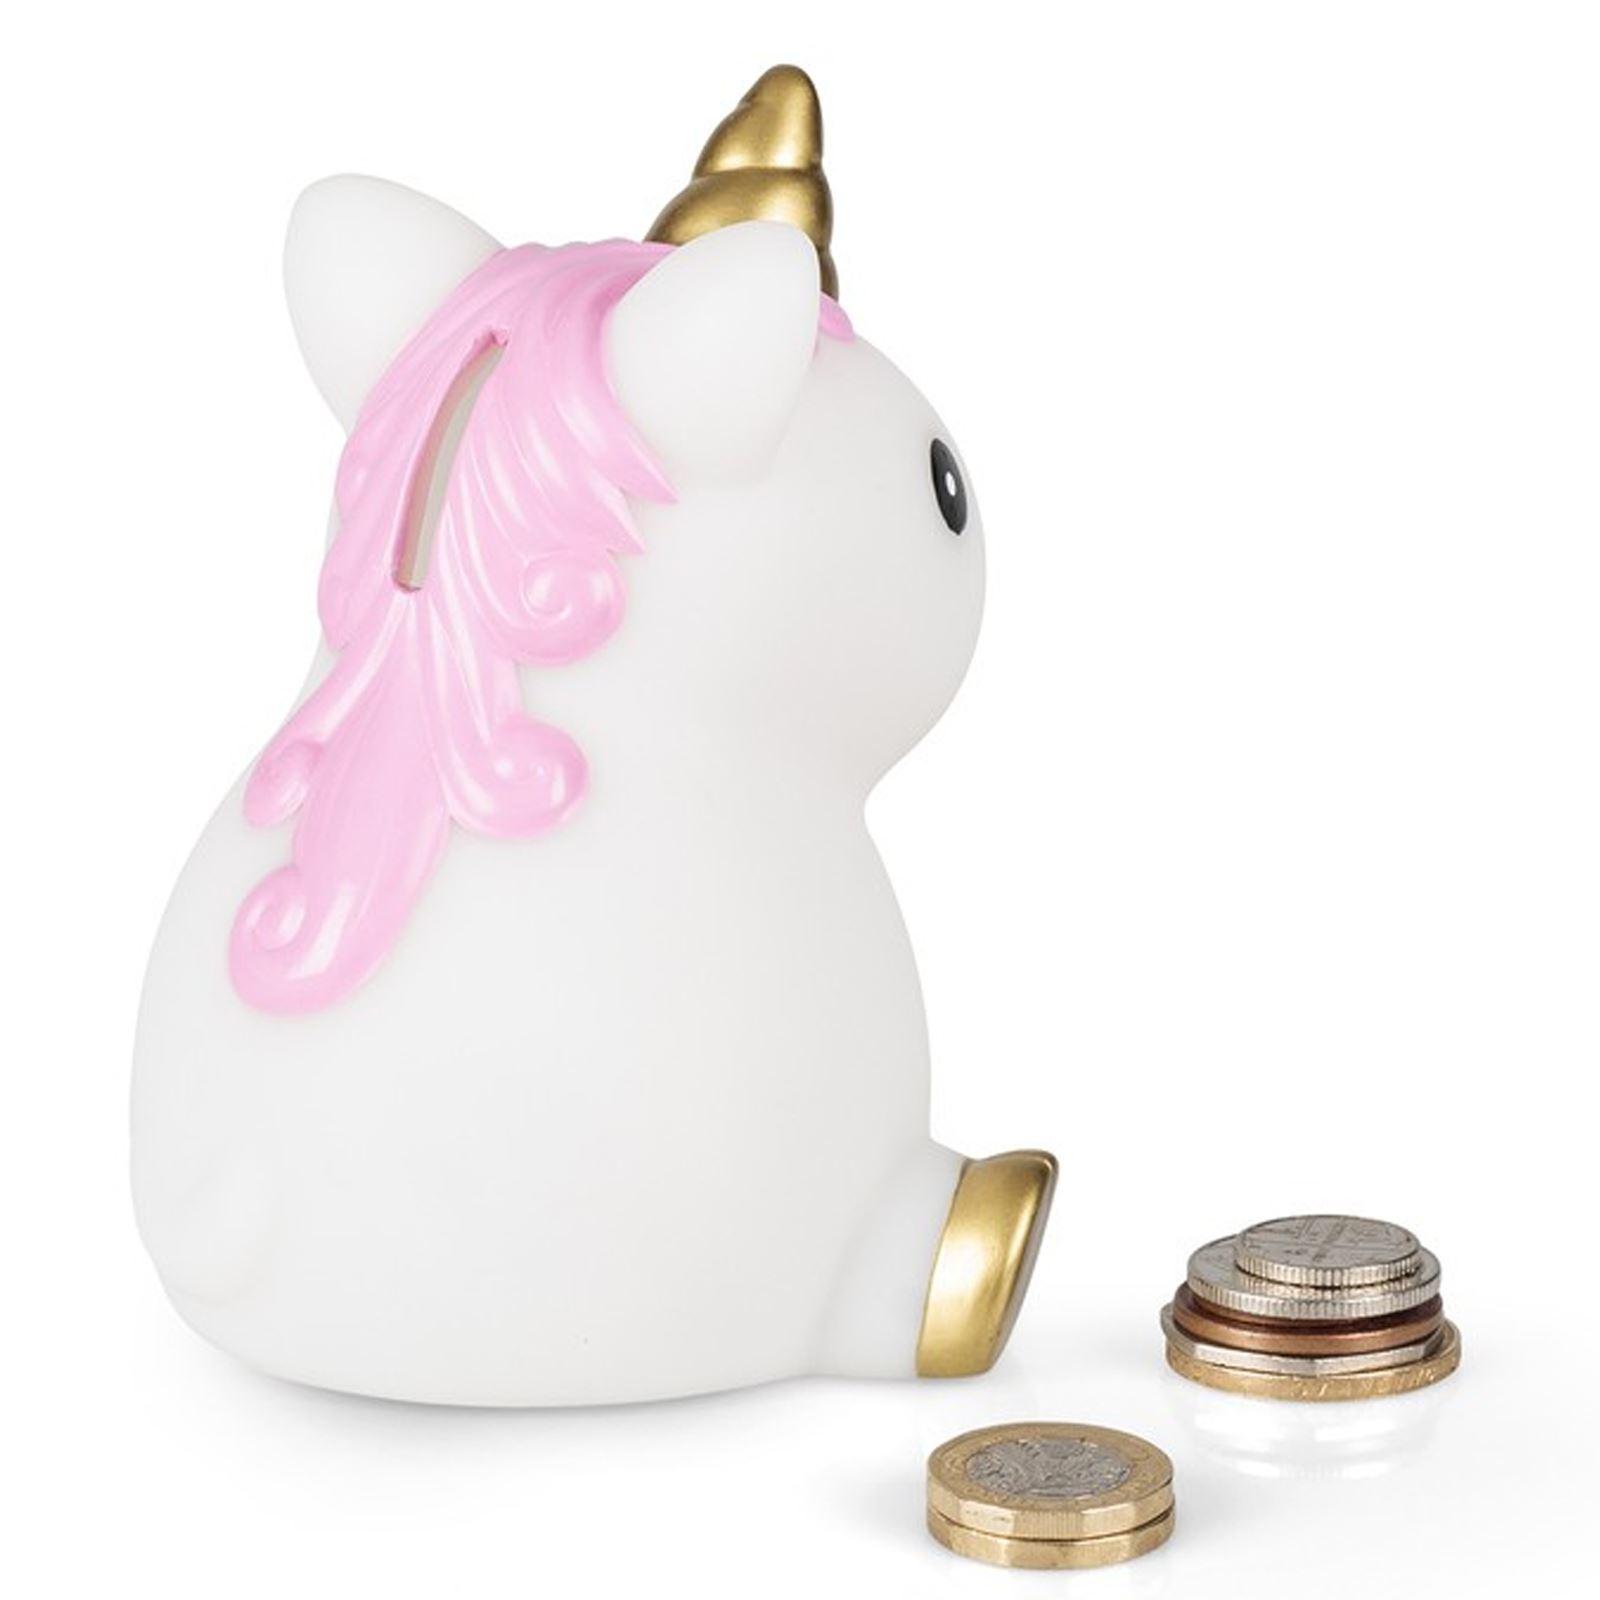 Childrens unicorn shaped money box xmas stocking filler